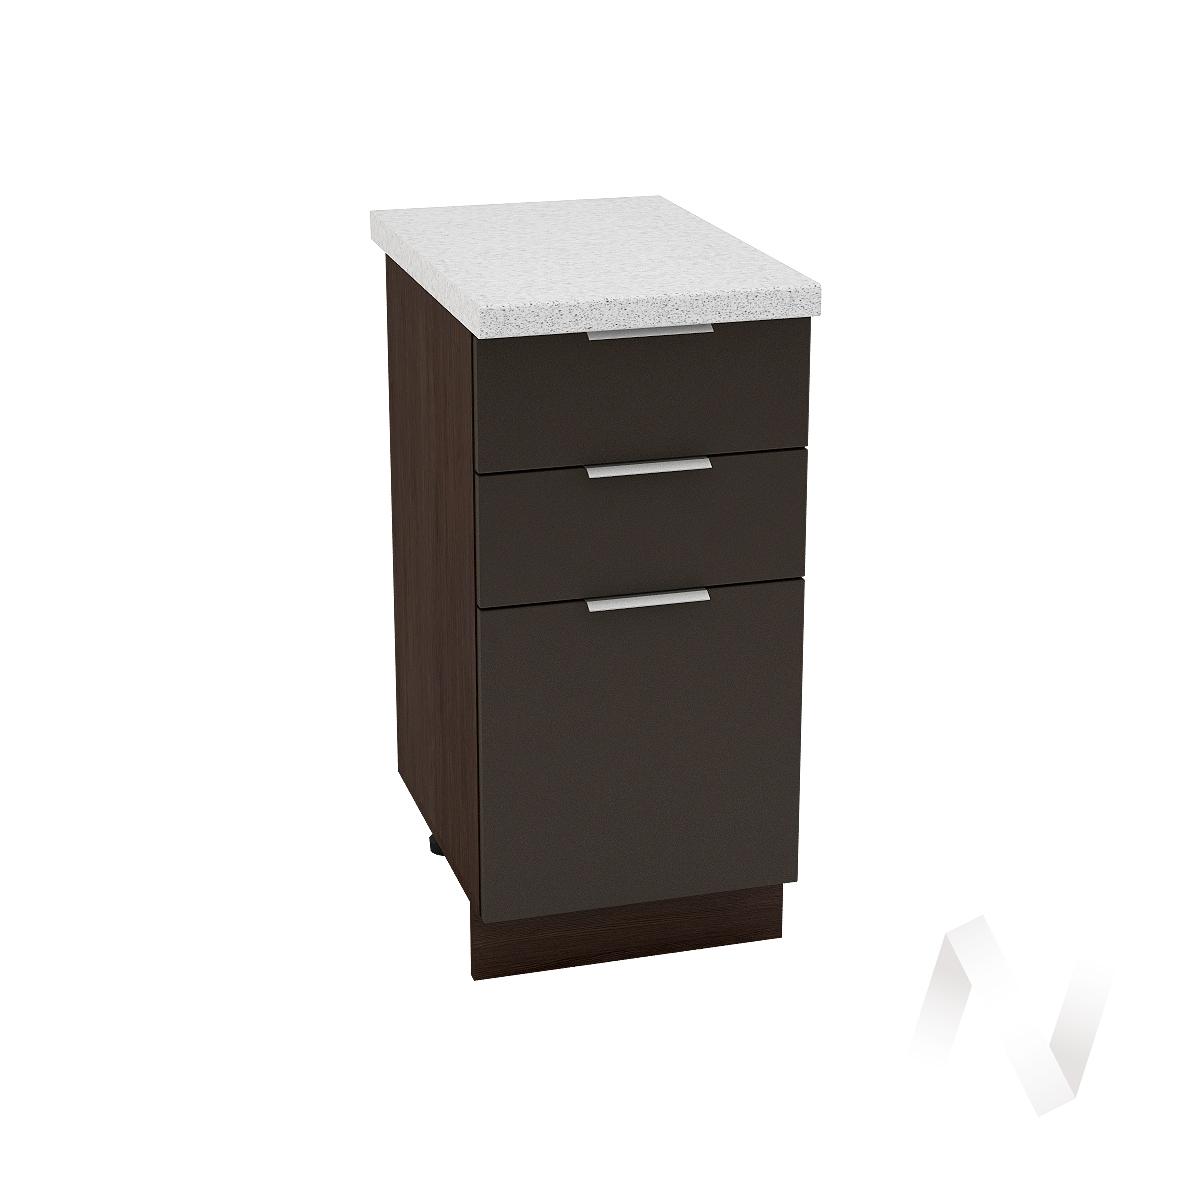 "Кухня ""Терра"": Шкаф нижний с 3-мя ящиками 400, ШН3Я 400 (смоки софт/корпус венге)"